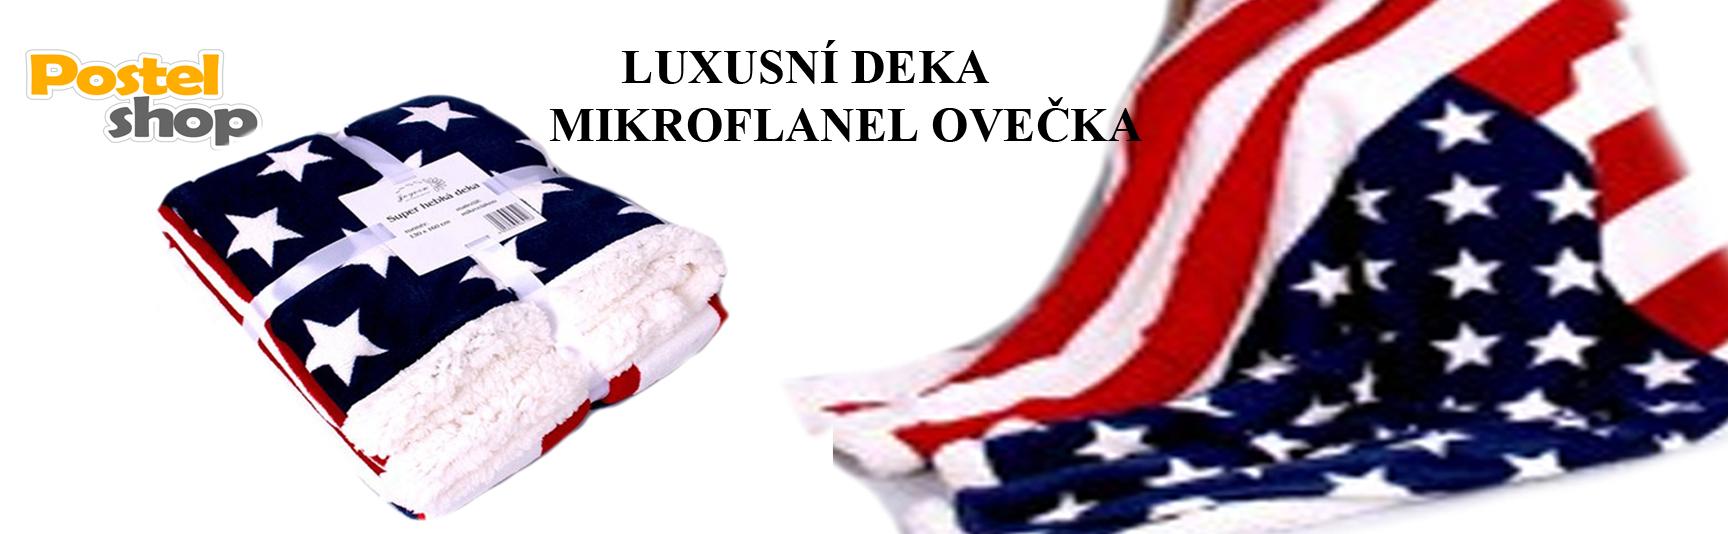 deka luxusní amerika